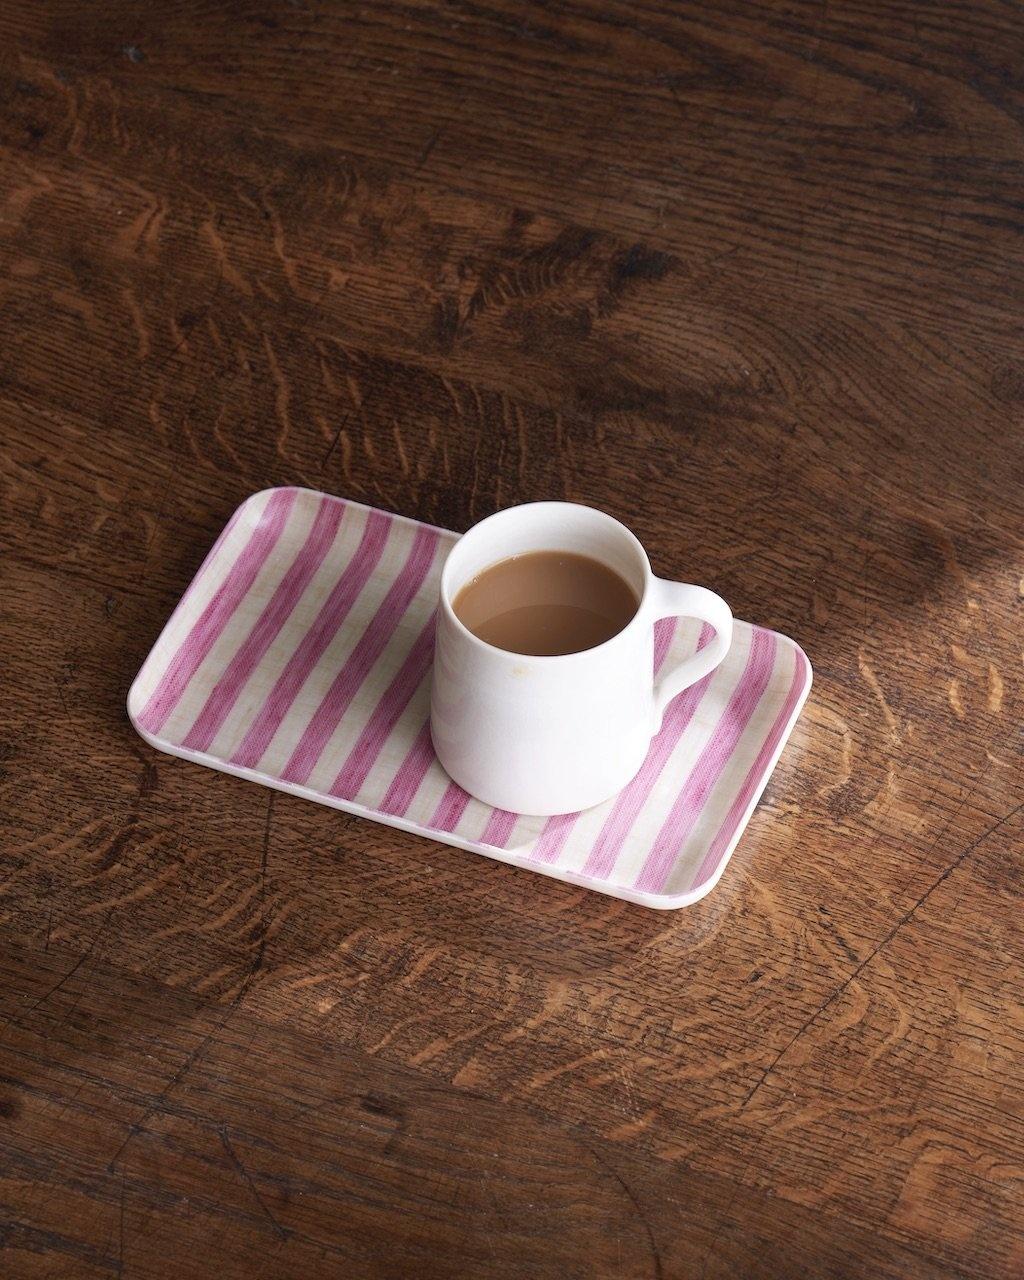 Fog Linen Work Linen Coated Tray Small